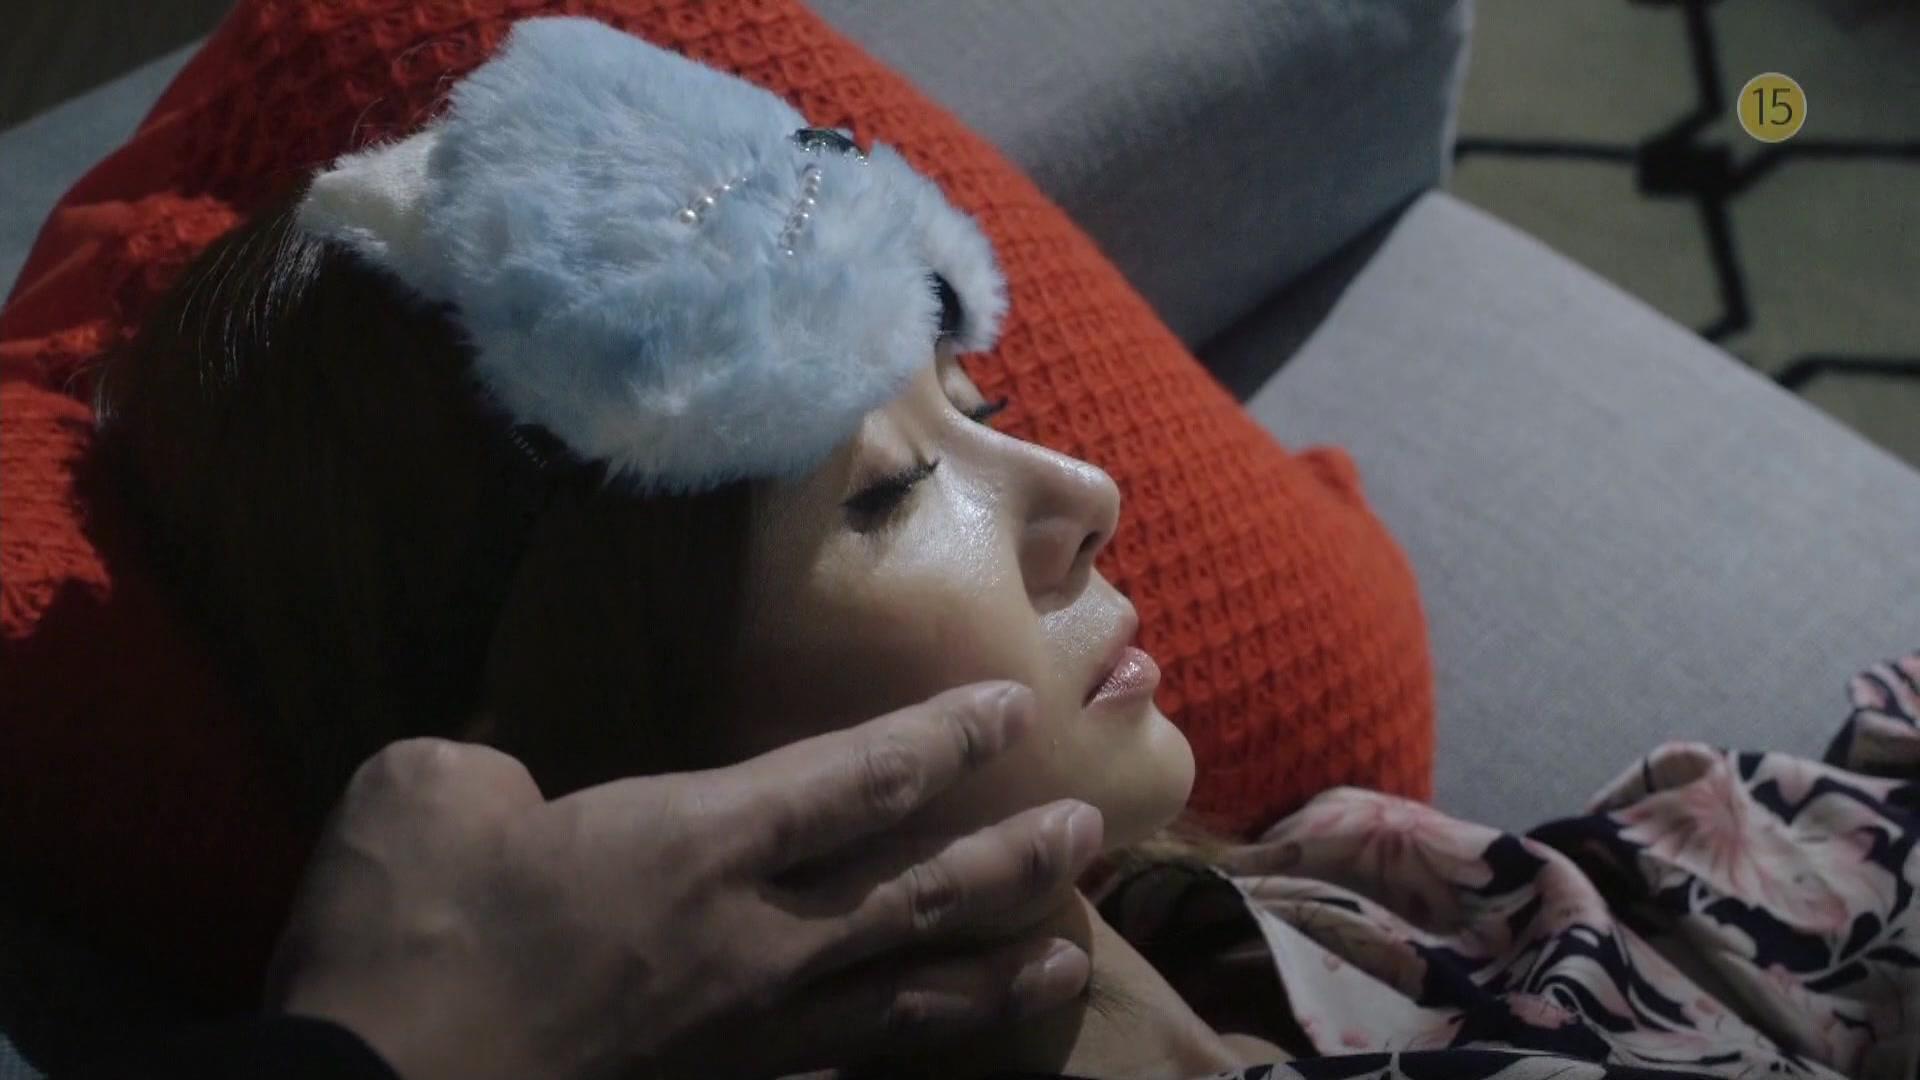 Trailer 2: Sister Is Alive